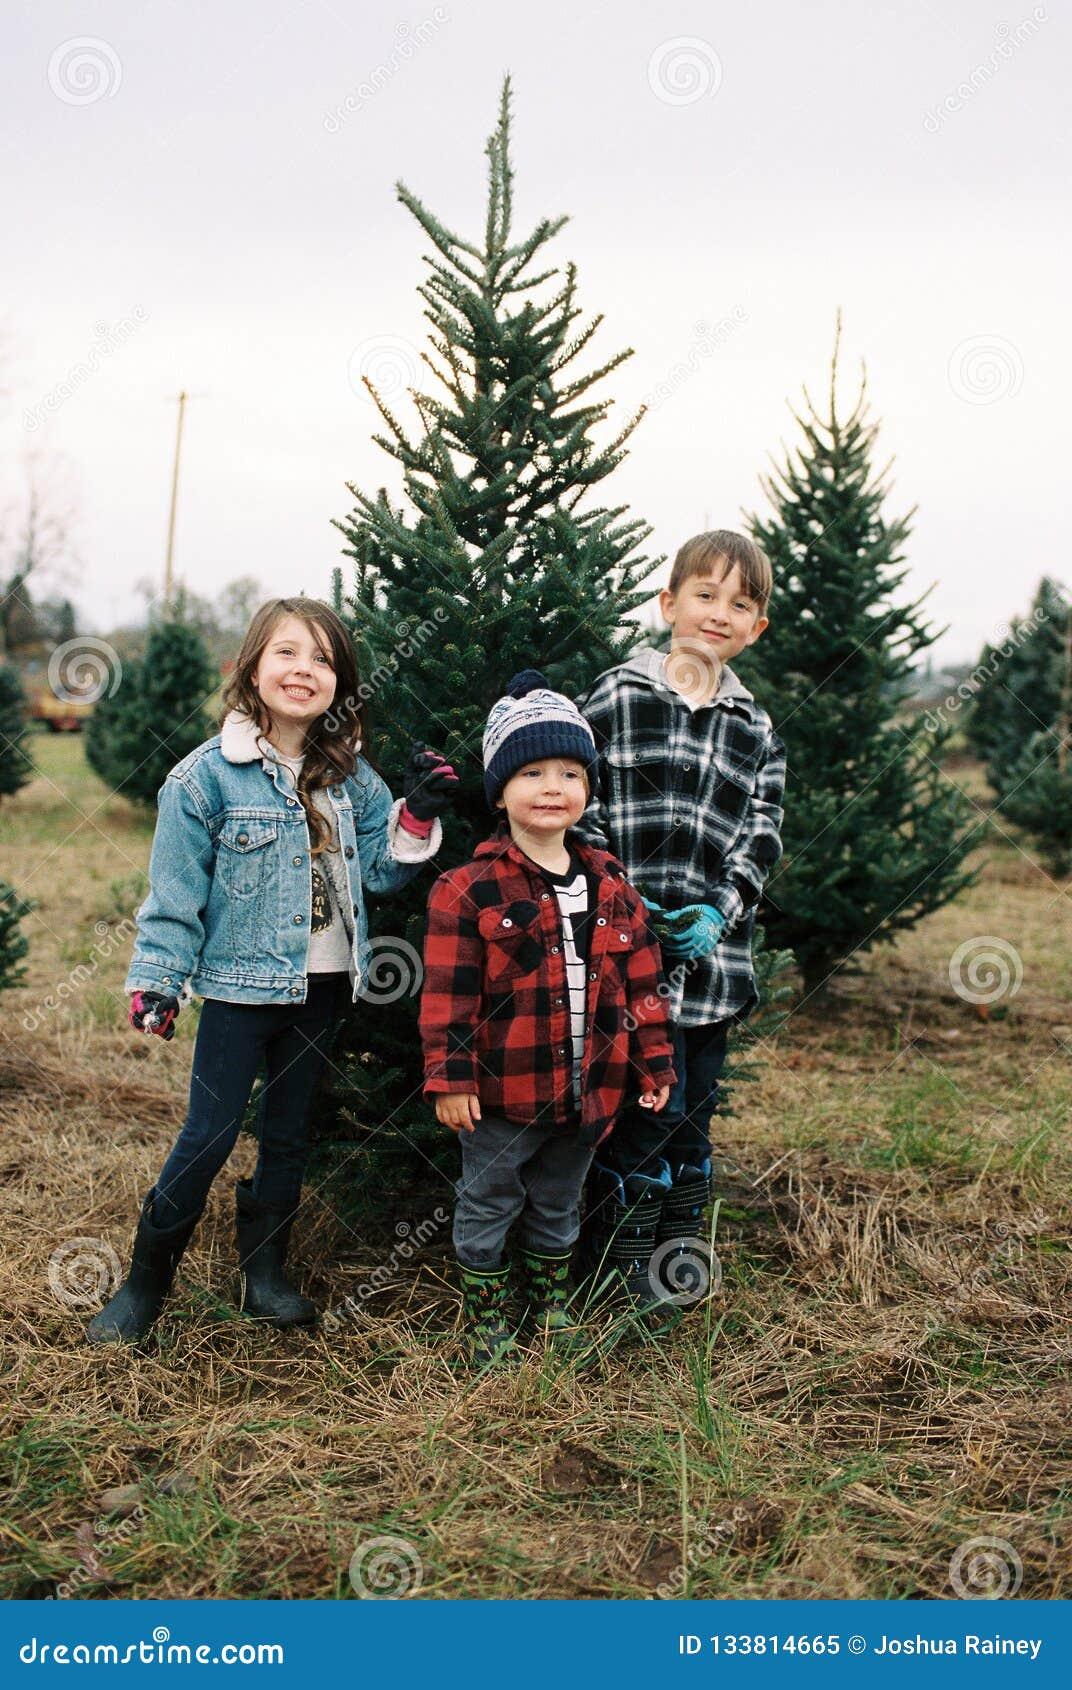 Christmas Tree Farm Film Scans With Oregon Kid Stock Image Image Of Happy Lifestyle 133814665